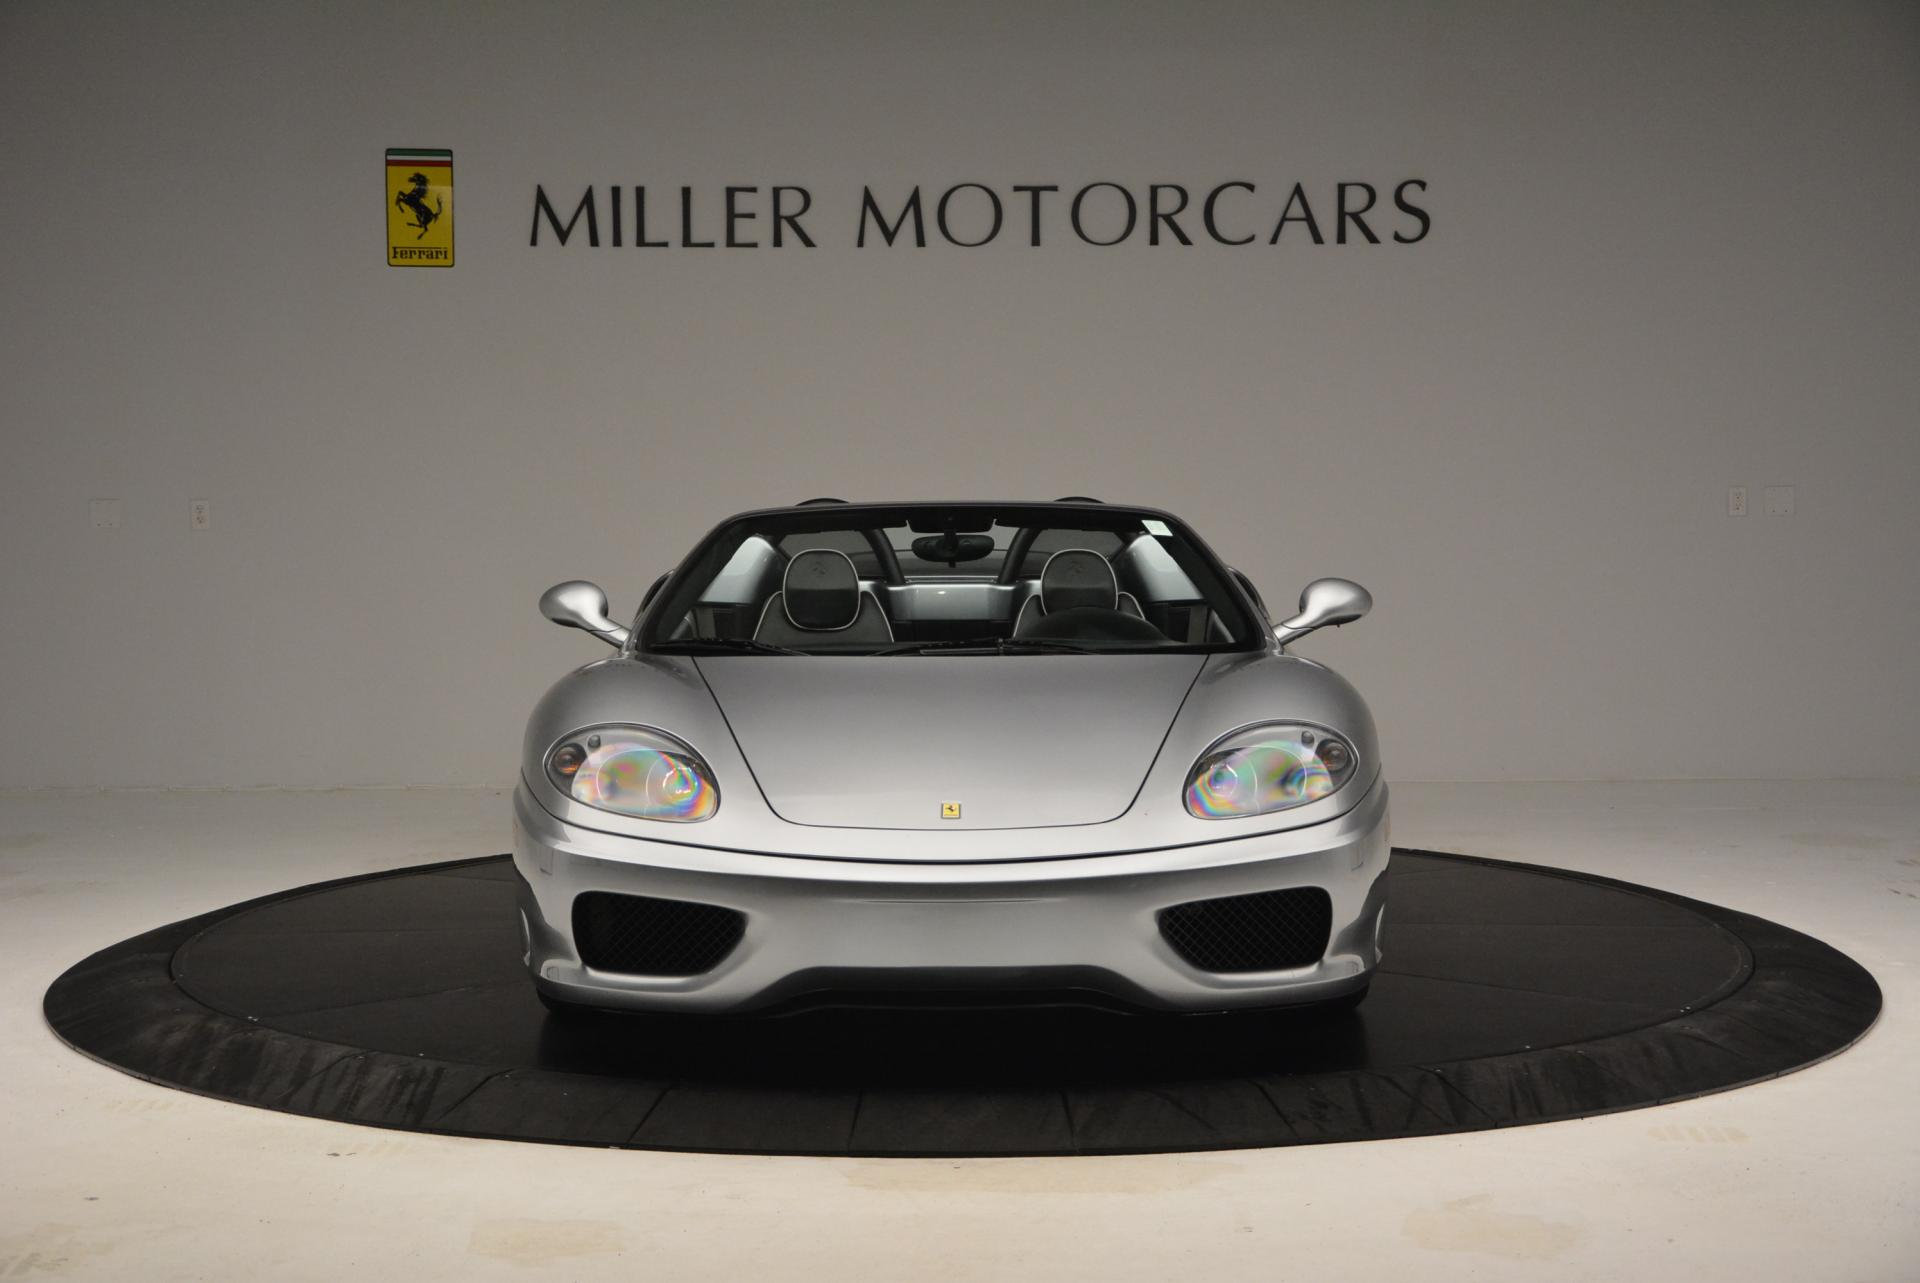 Used 2004 Ferrari 360 Spider 6-Speed Manual  For Sale In Greenwich, CT. Alfa Romeo of Greenwich, 4317 138_p12